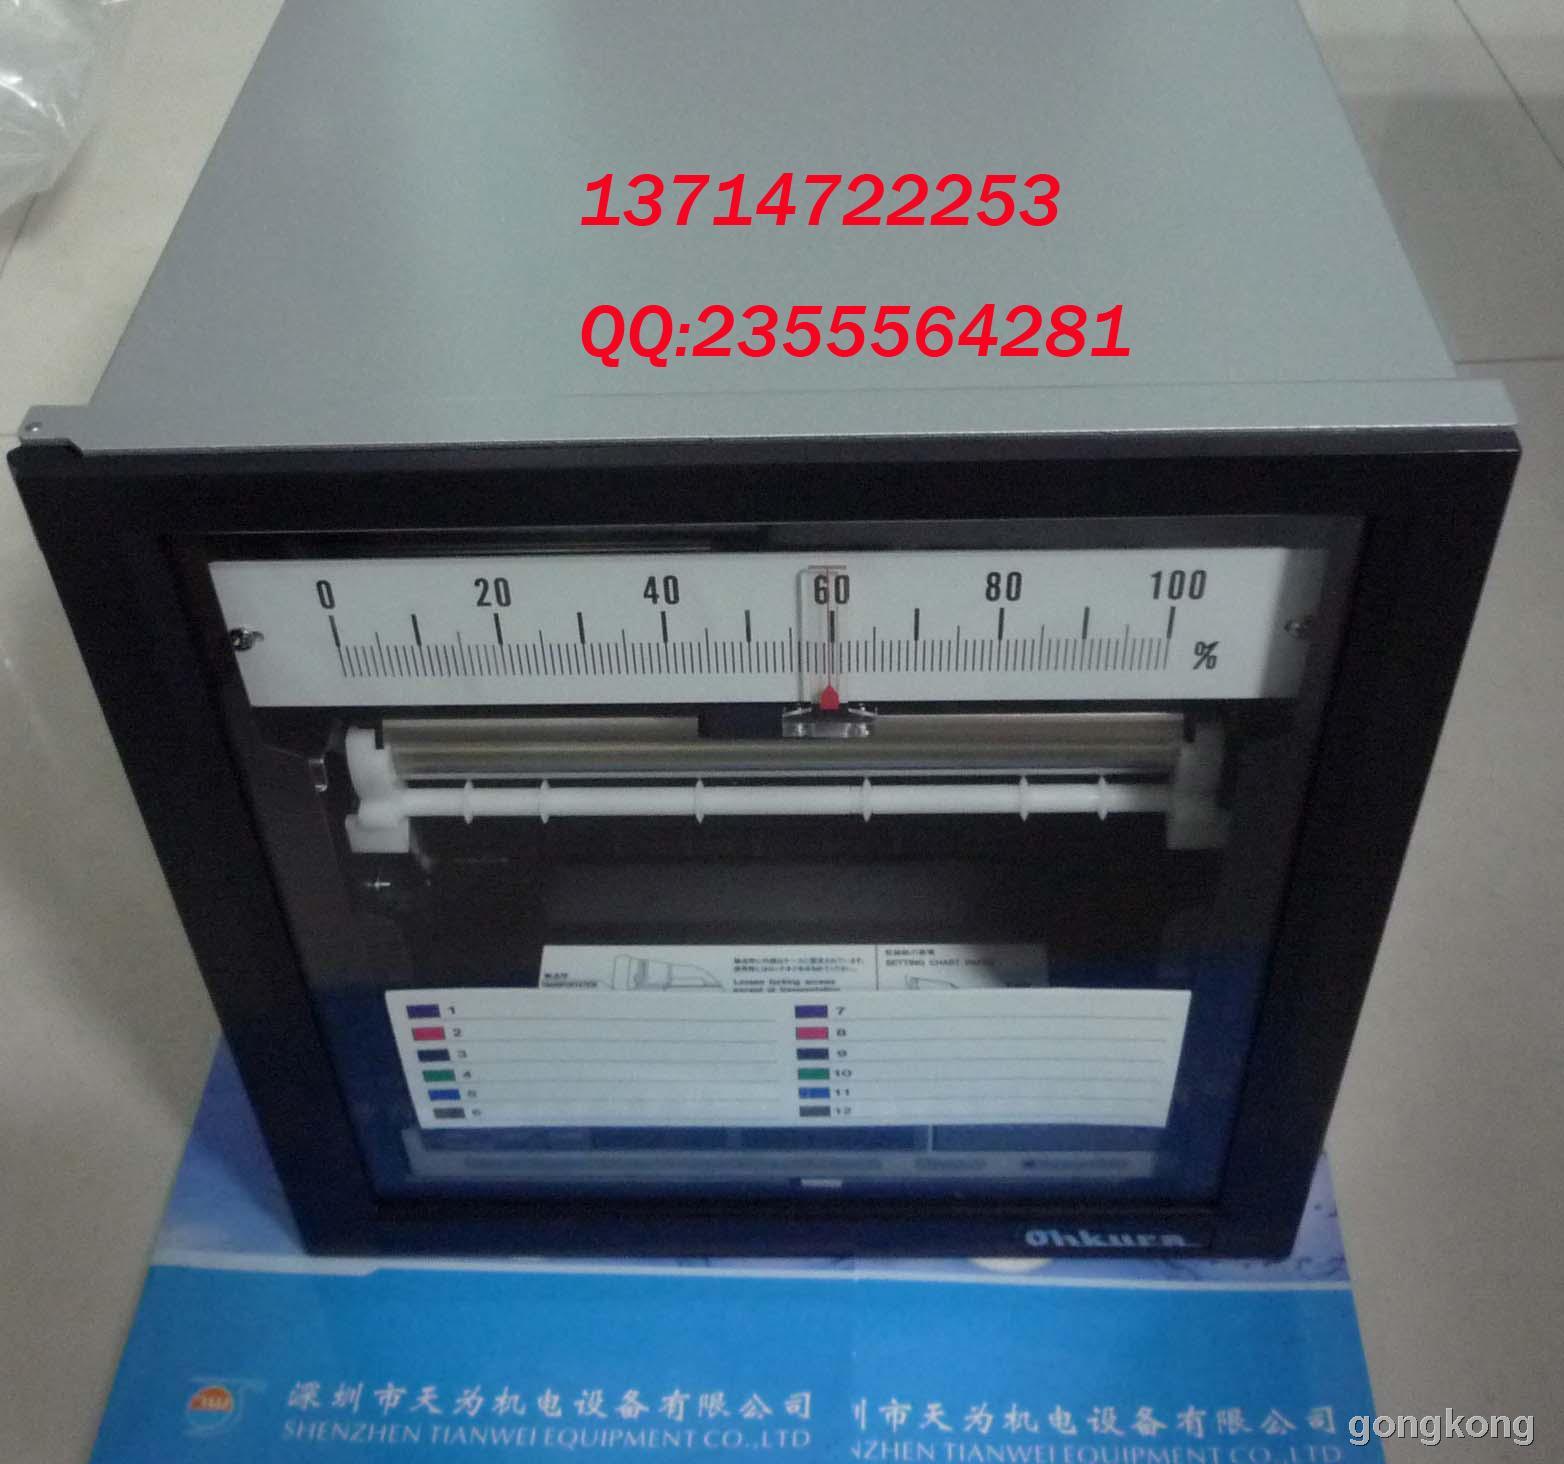 OHKURA日本大仓RM1812L00001A00记录仪12通道